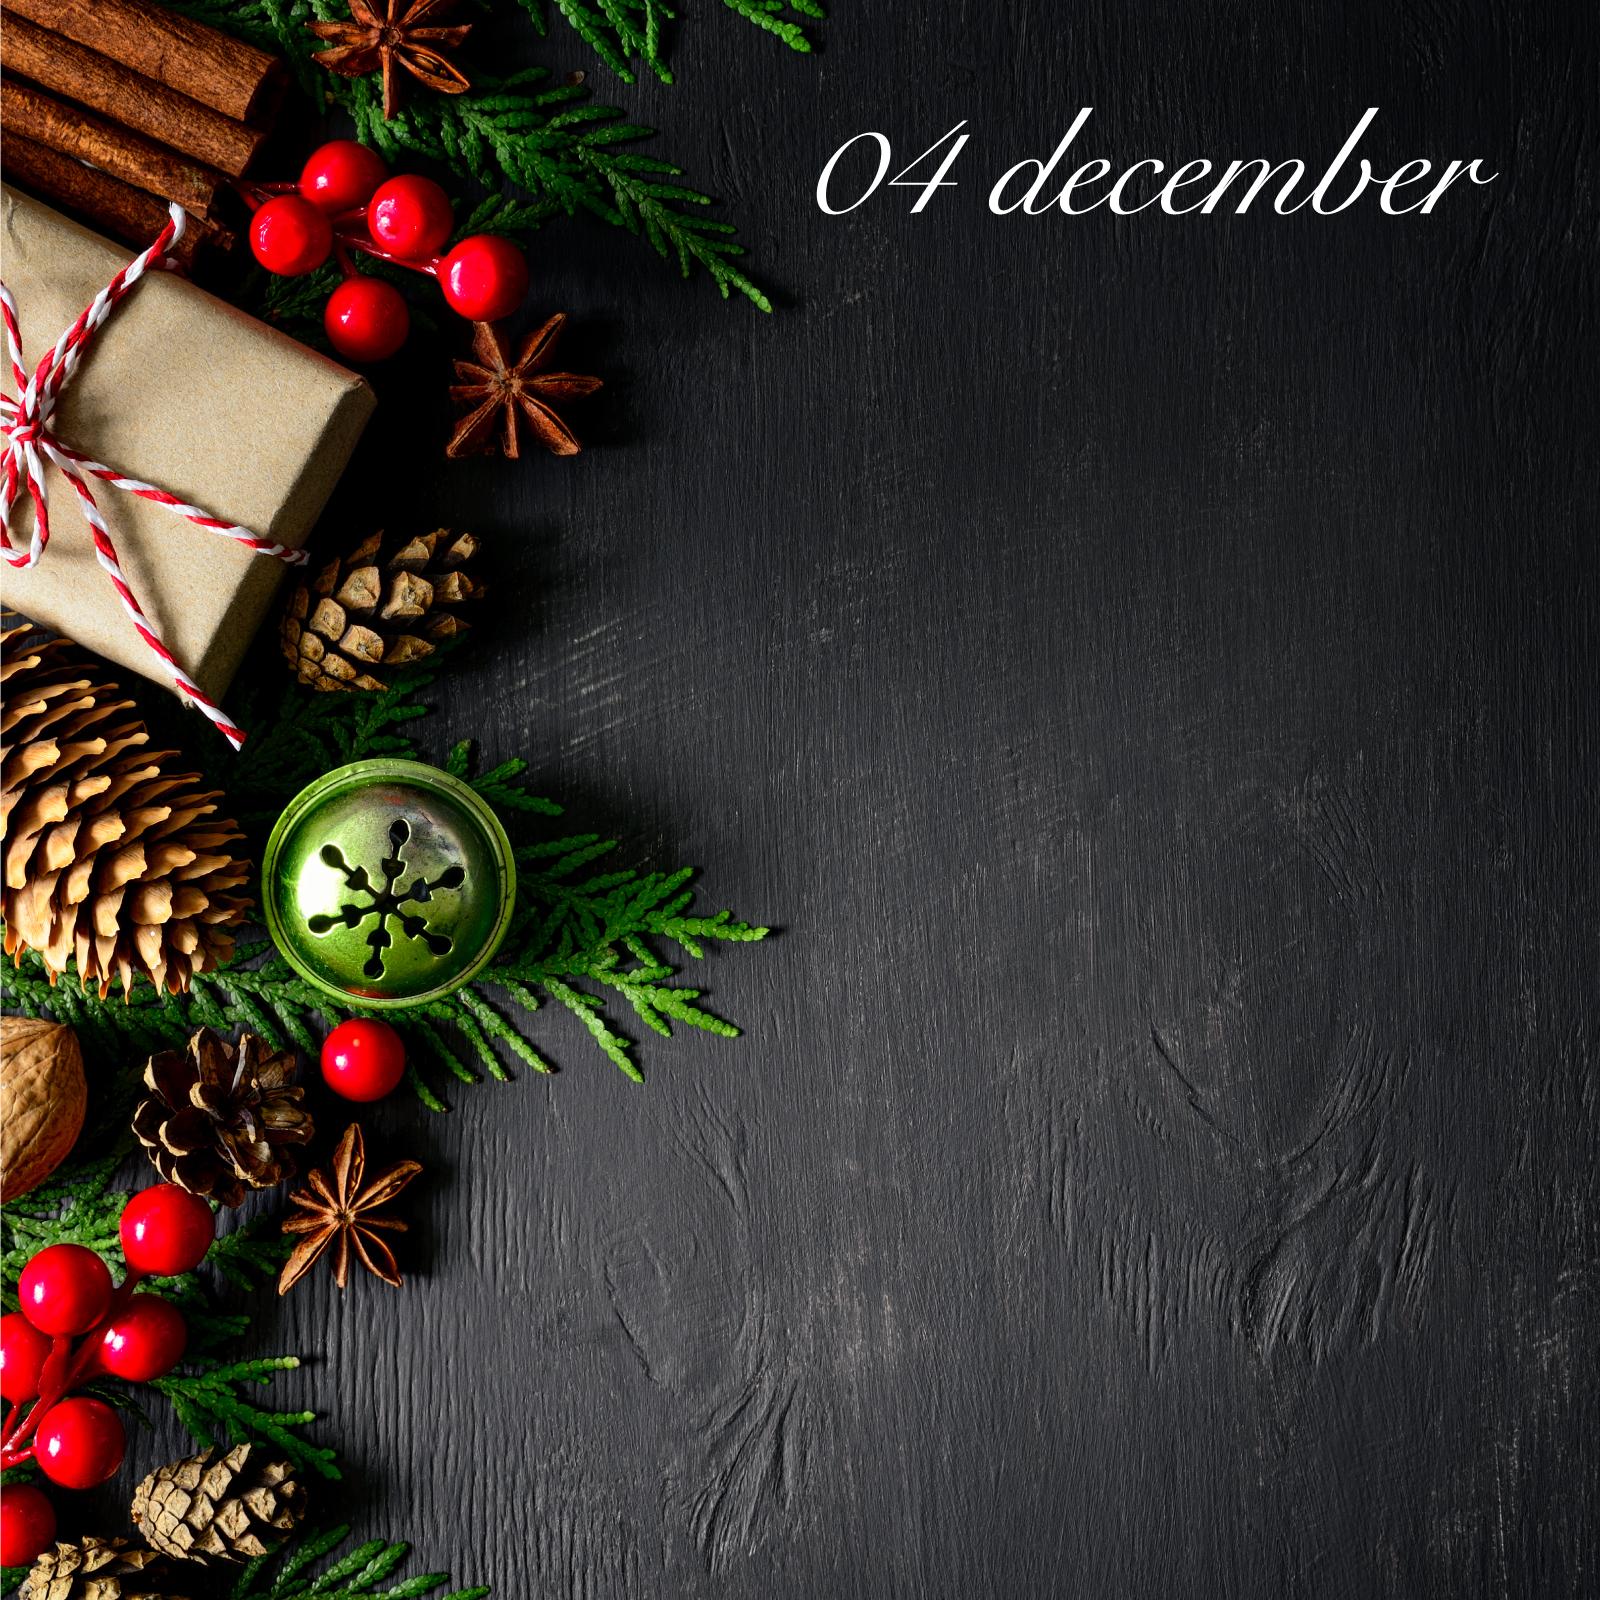 4 december